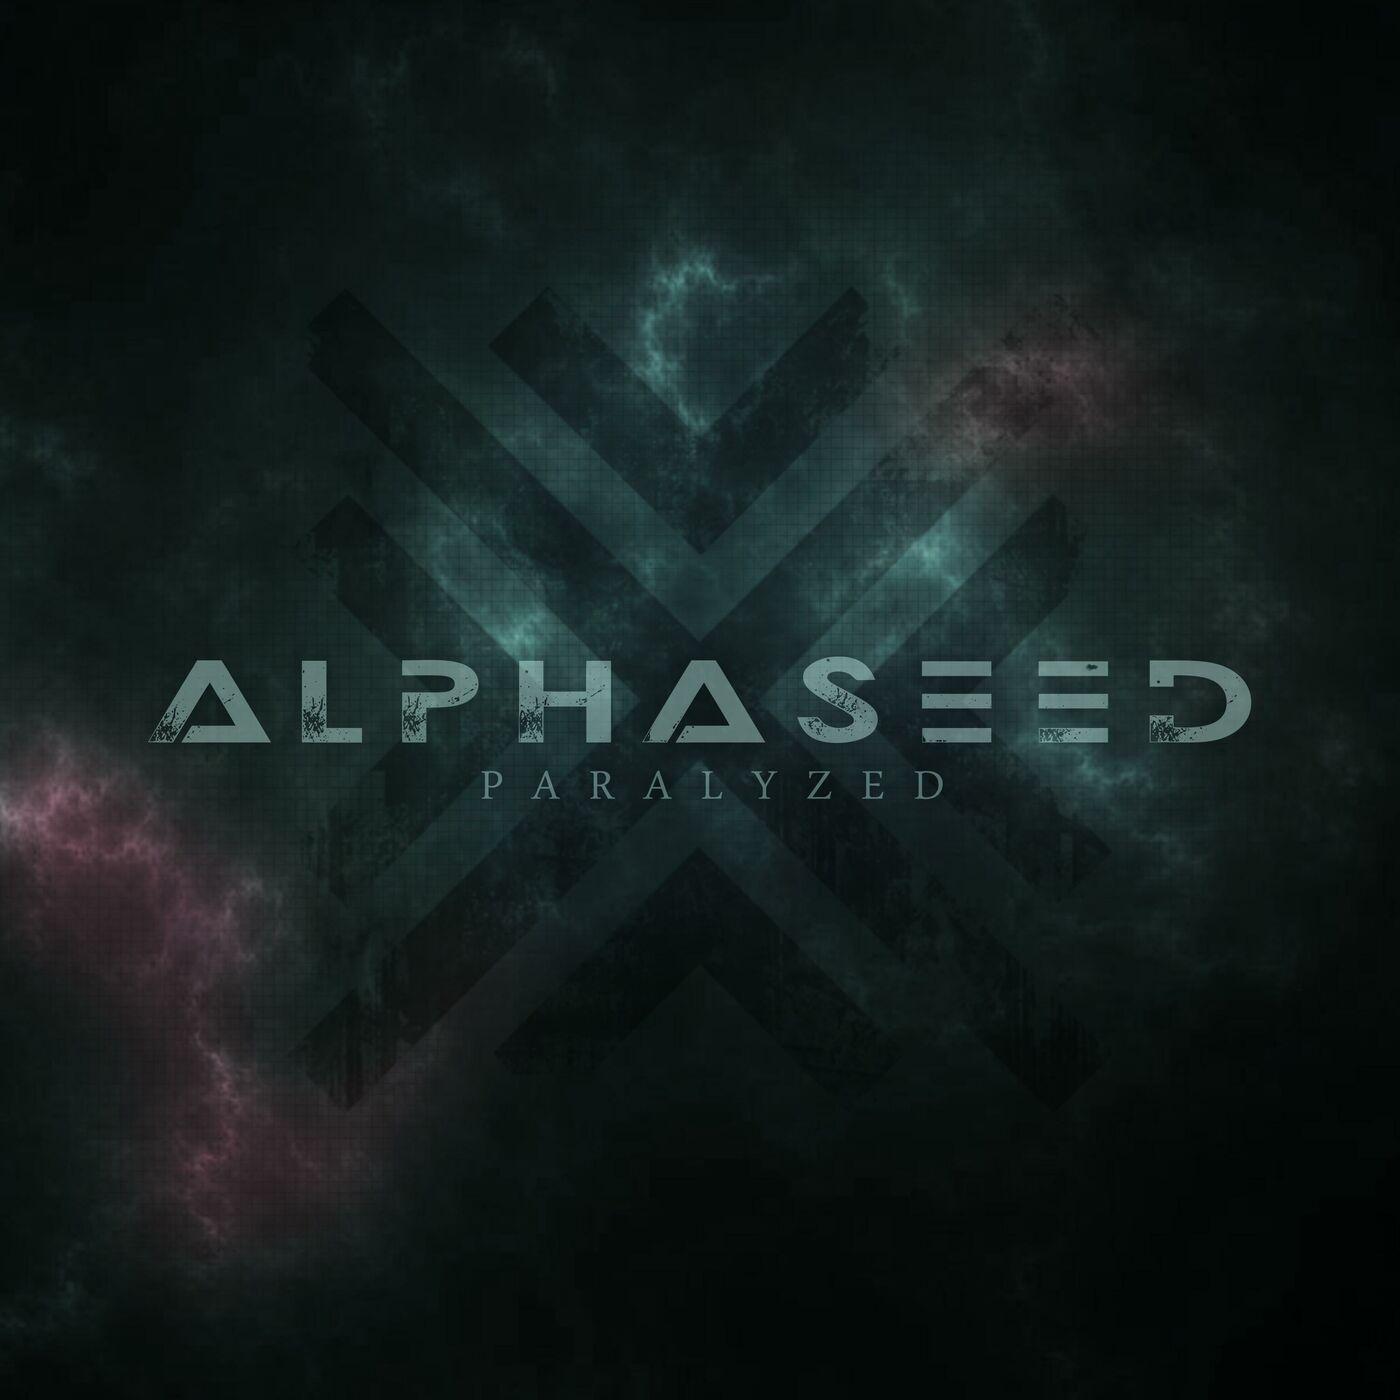 Alpha Seed - Paralyzed [EP] (2017)